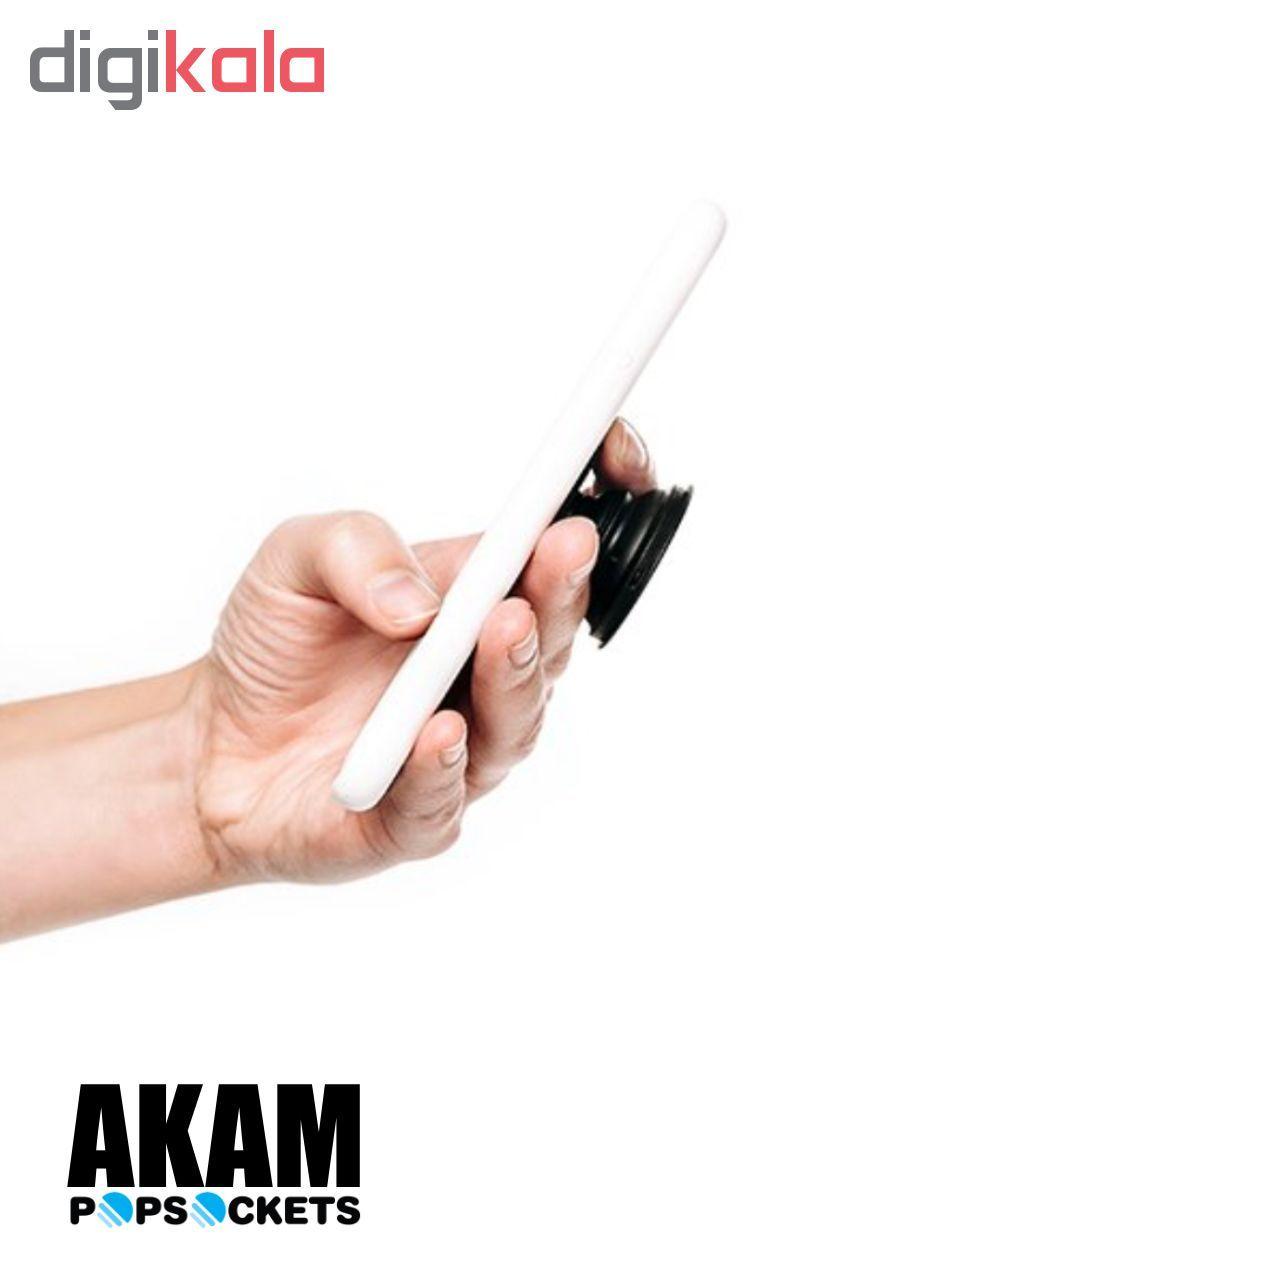 پایه نگهدارنده گوشی موبایل پاپ سوکت آکام مدل APS0161 main 1 8